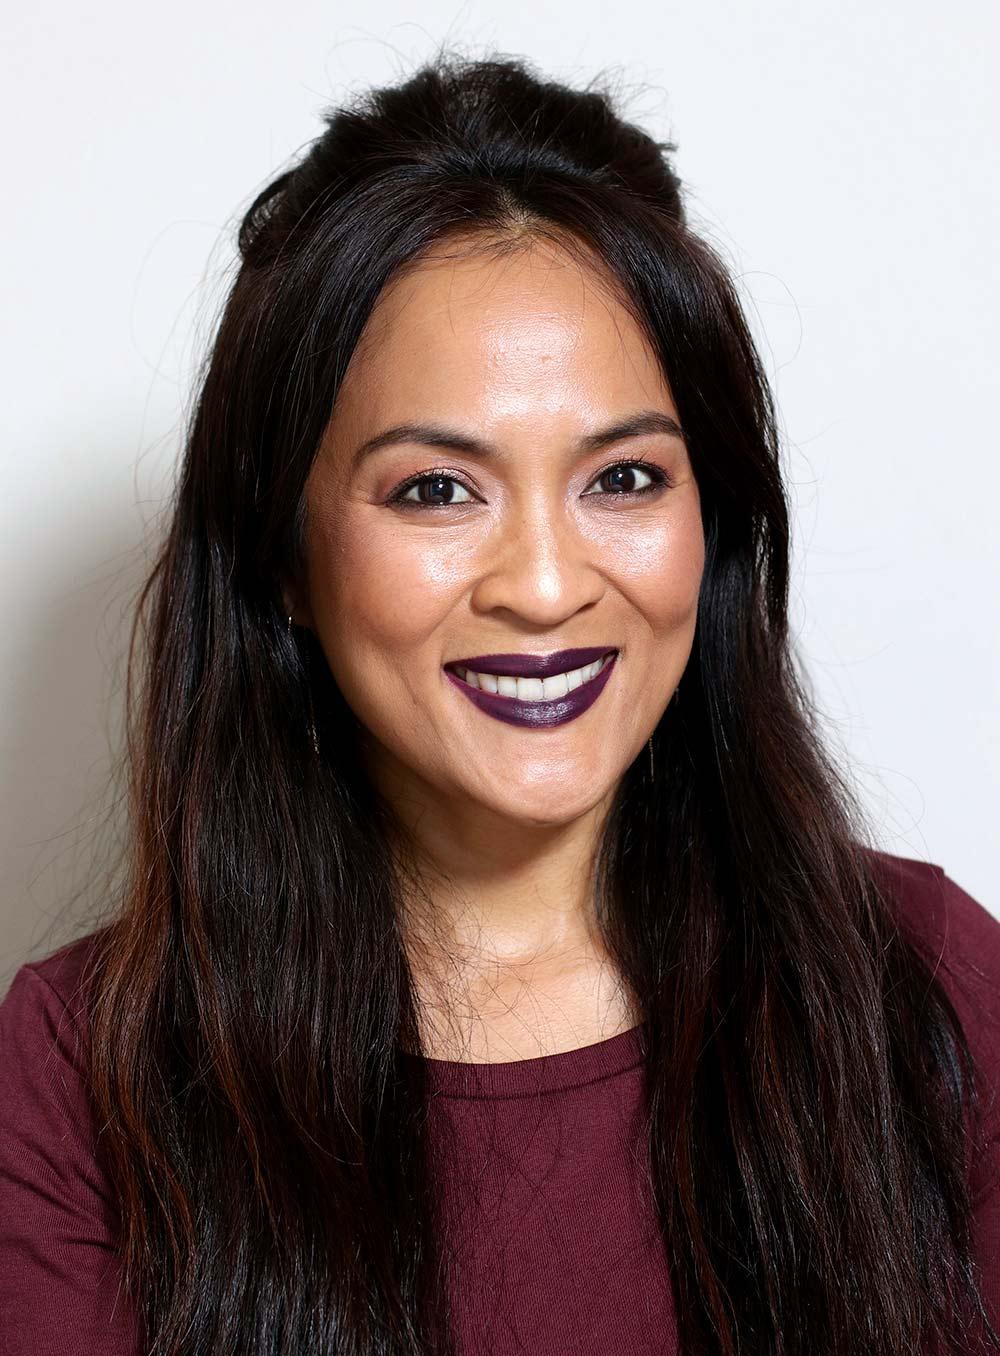 Unsung Makeup Heroes Shiseido Synchro Skin Lasting Liquid Foundation Broad Spectrum Spf 20 Makeup And Beauty Blog